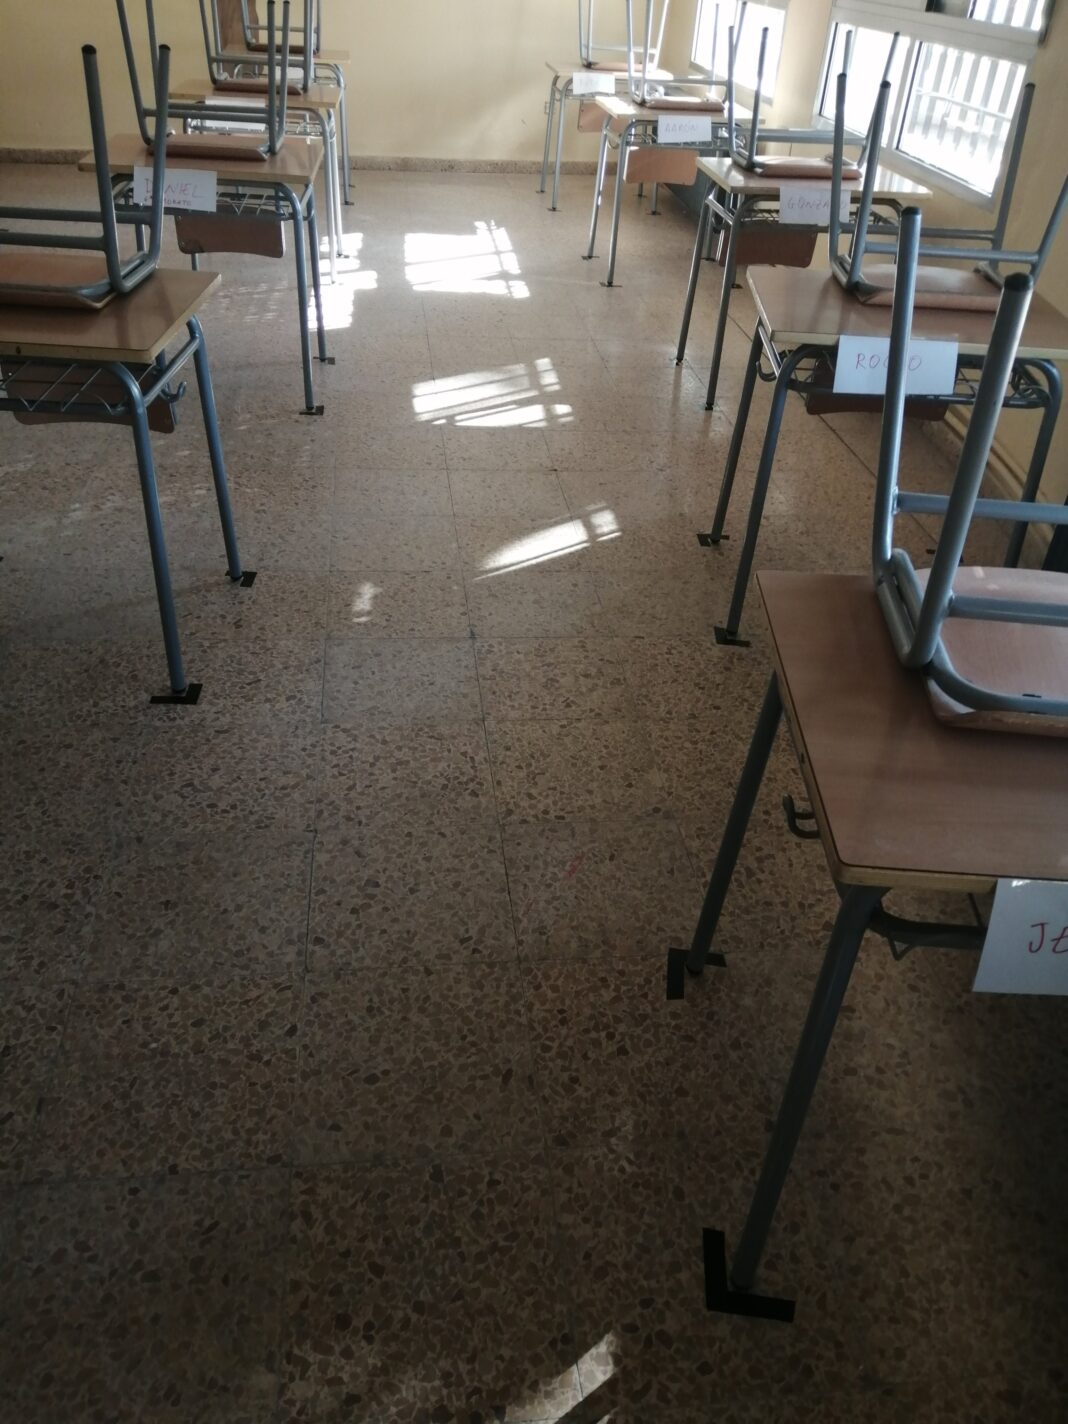 visita ceip carrasco alcalde curso seguro clases 1068x1424 - CEIP Carrasco Alcalde de Herencia prepara el inicio de curso seguro